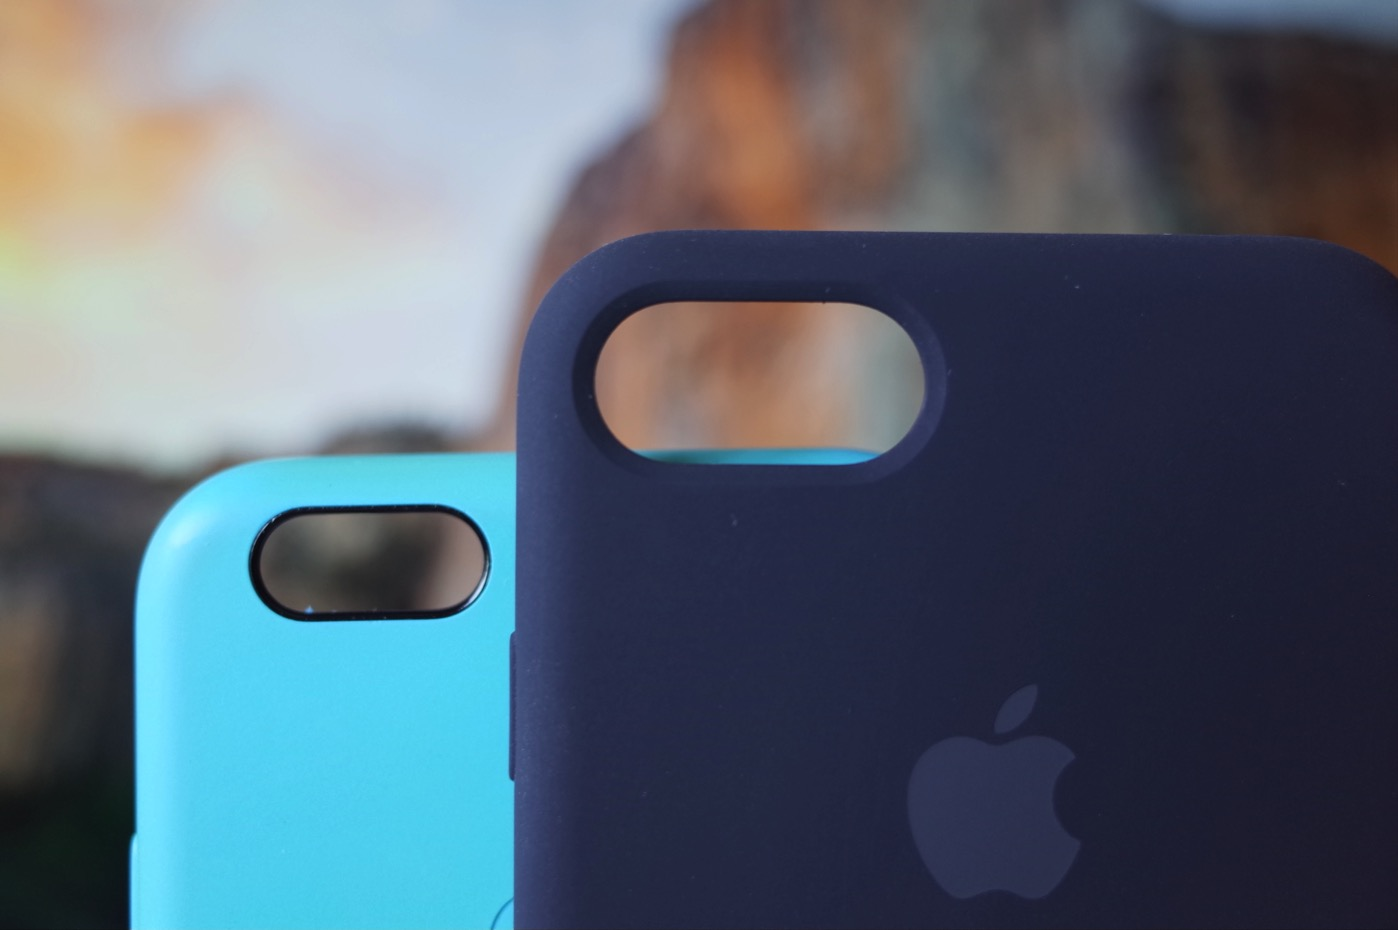 iPhone 7 &iPhone 6 -13